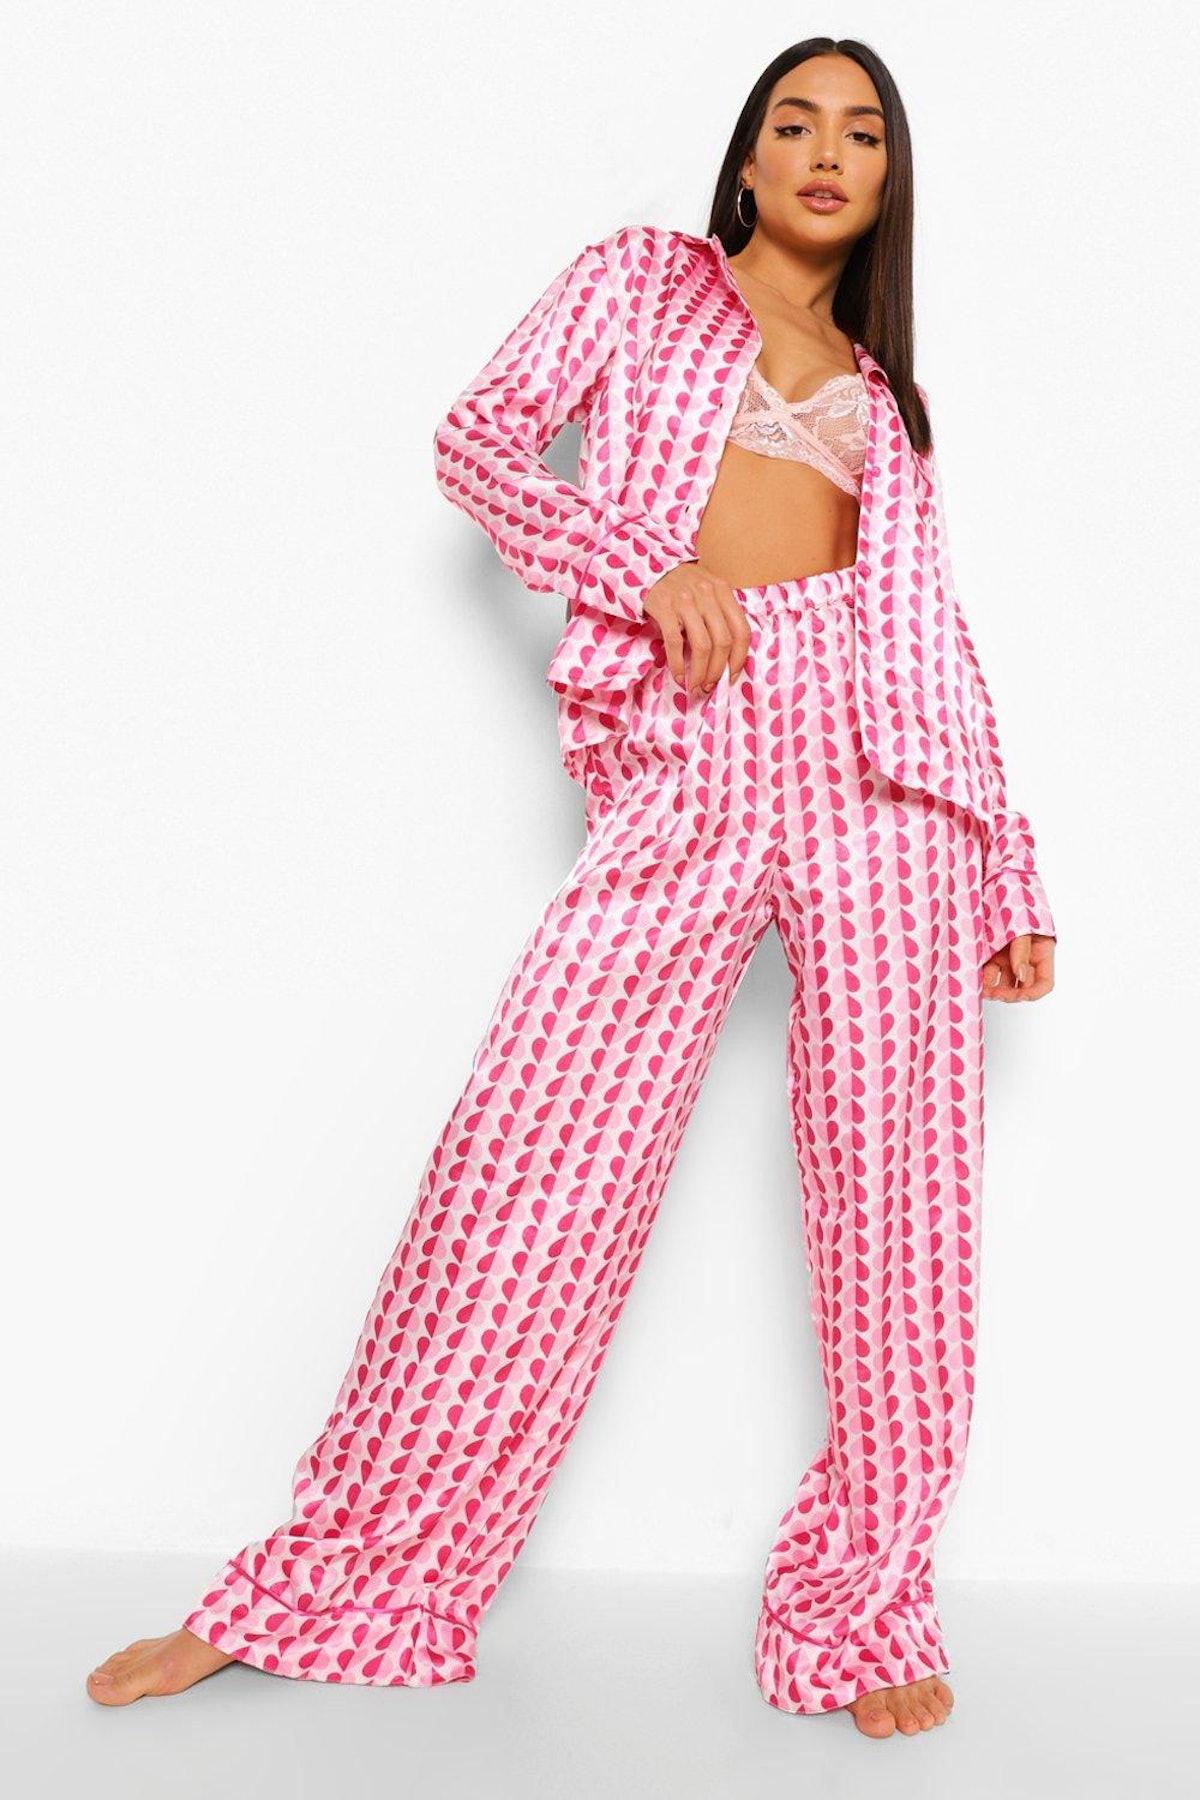 Boohoo Valentines Heart Satin Pyjamas